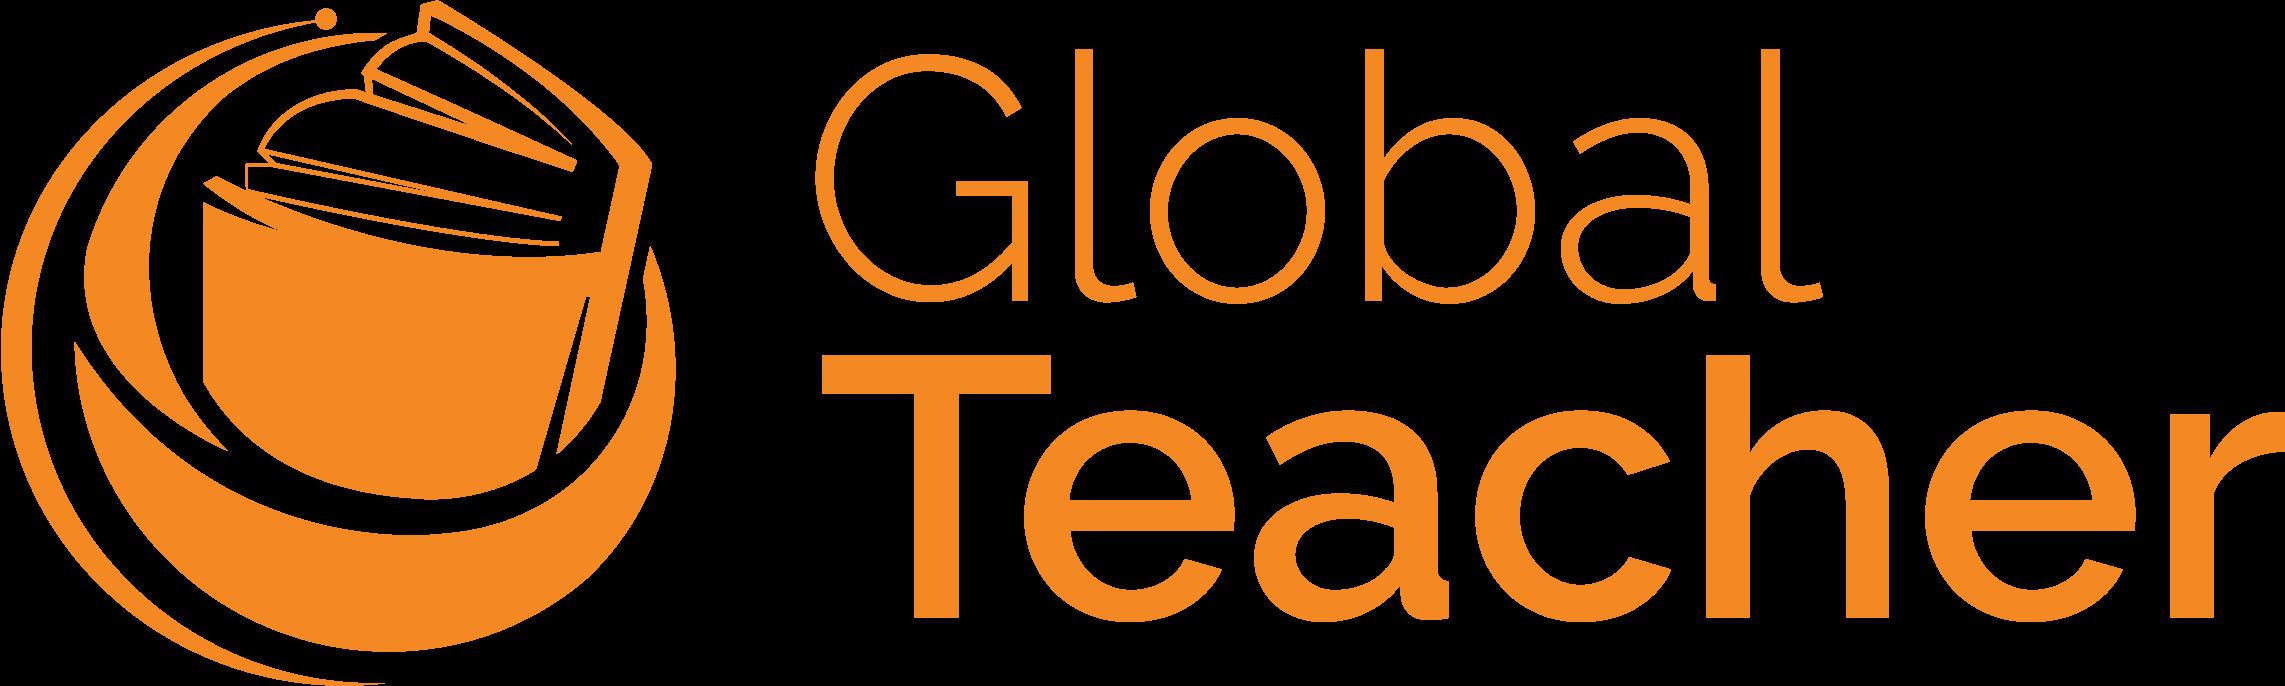 global teacher logo